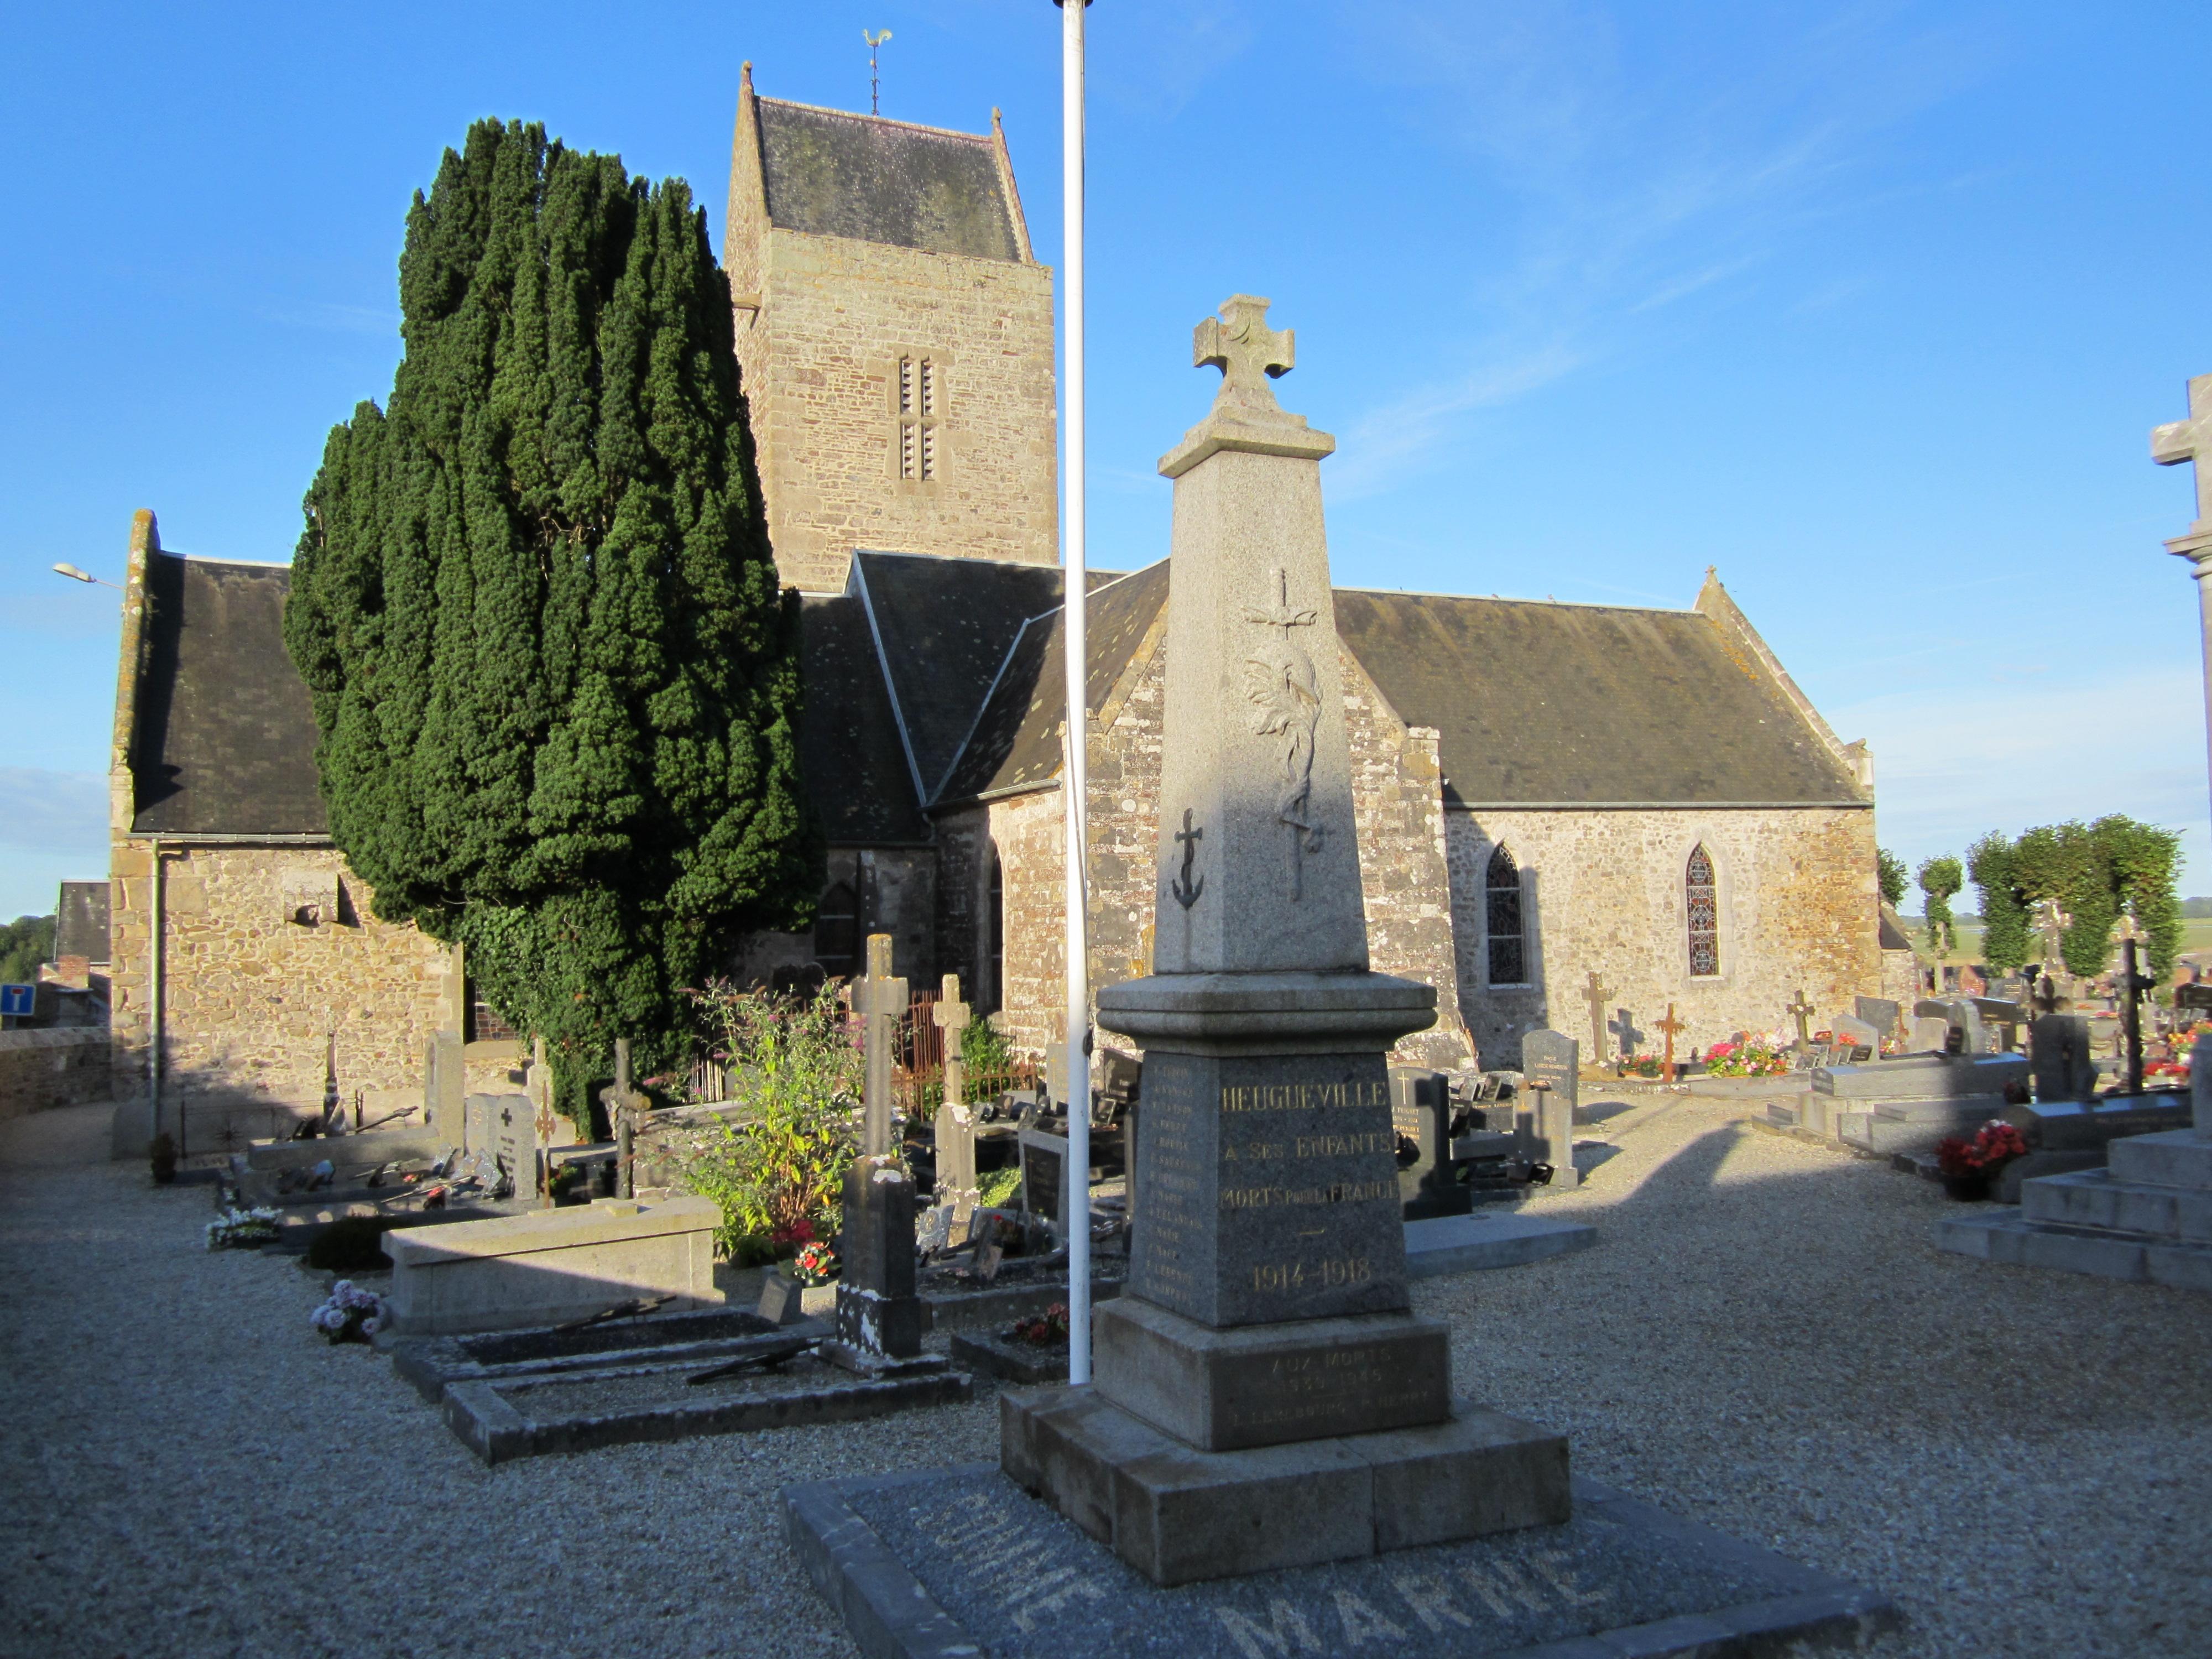 Heugueville-sur-Sienne